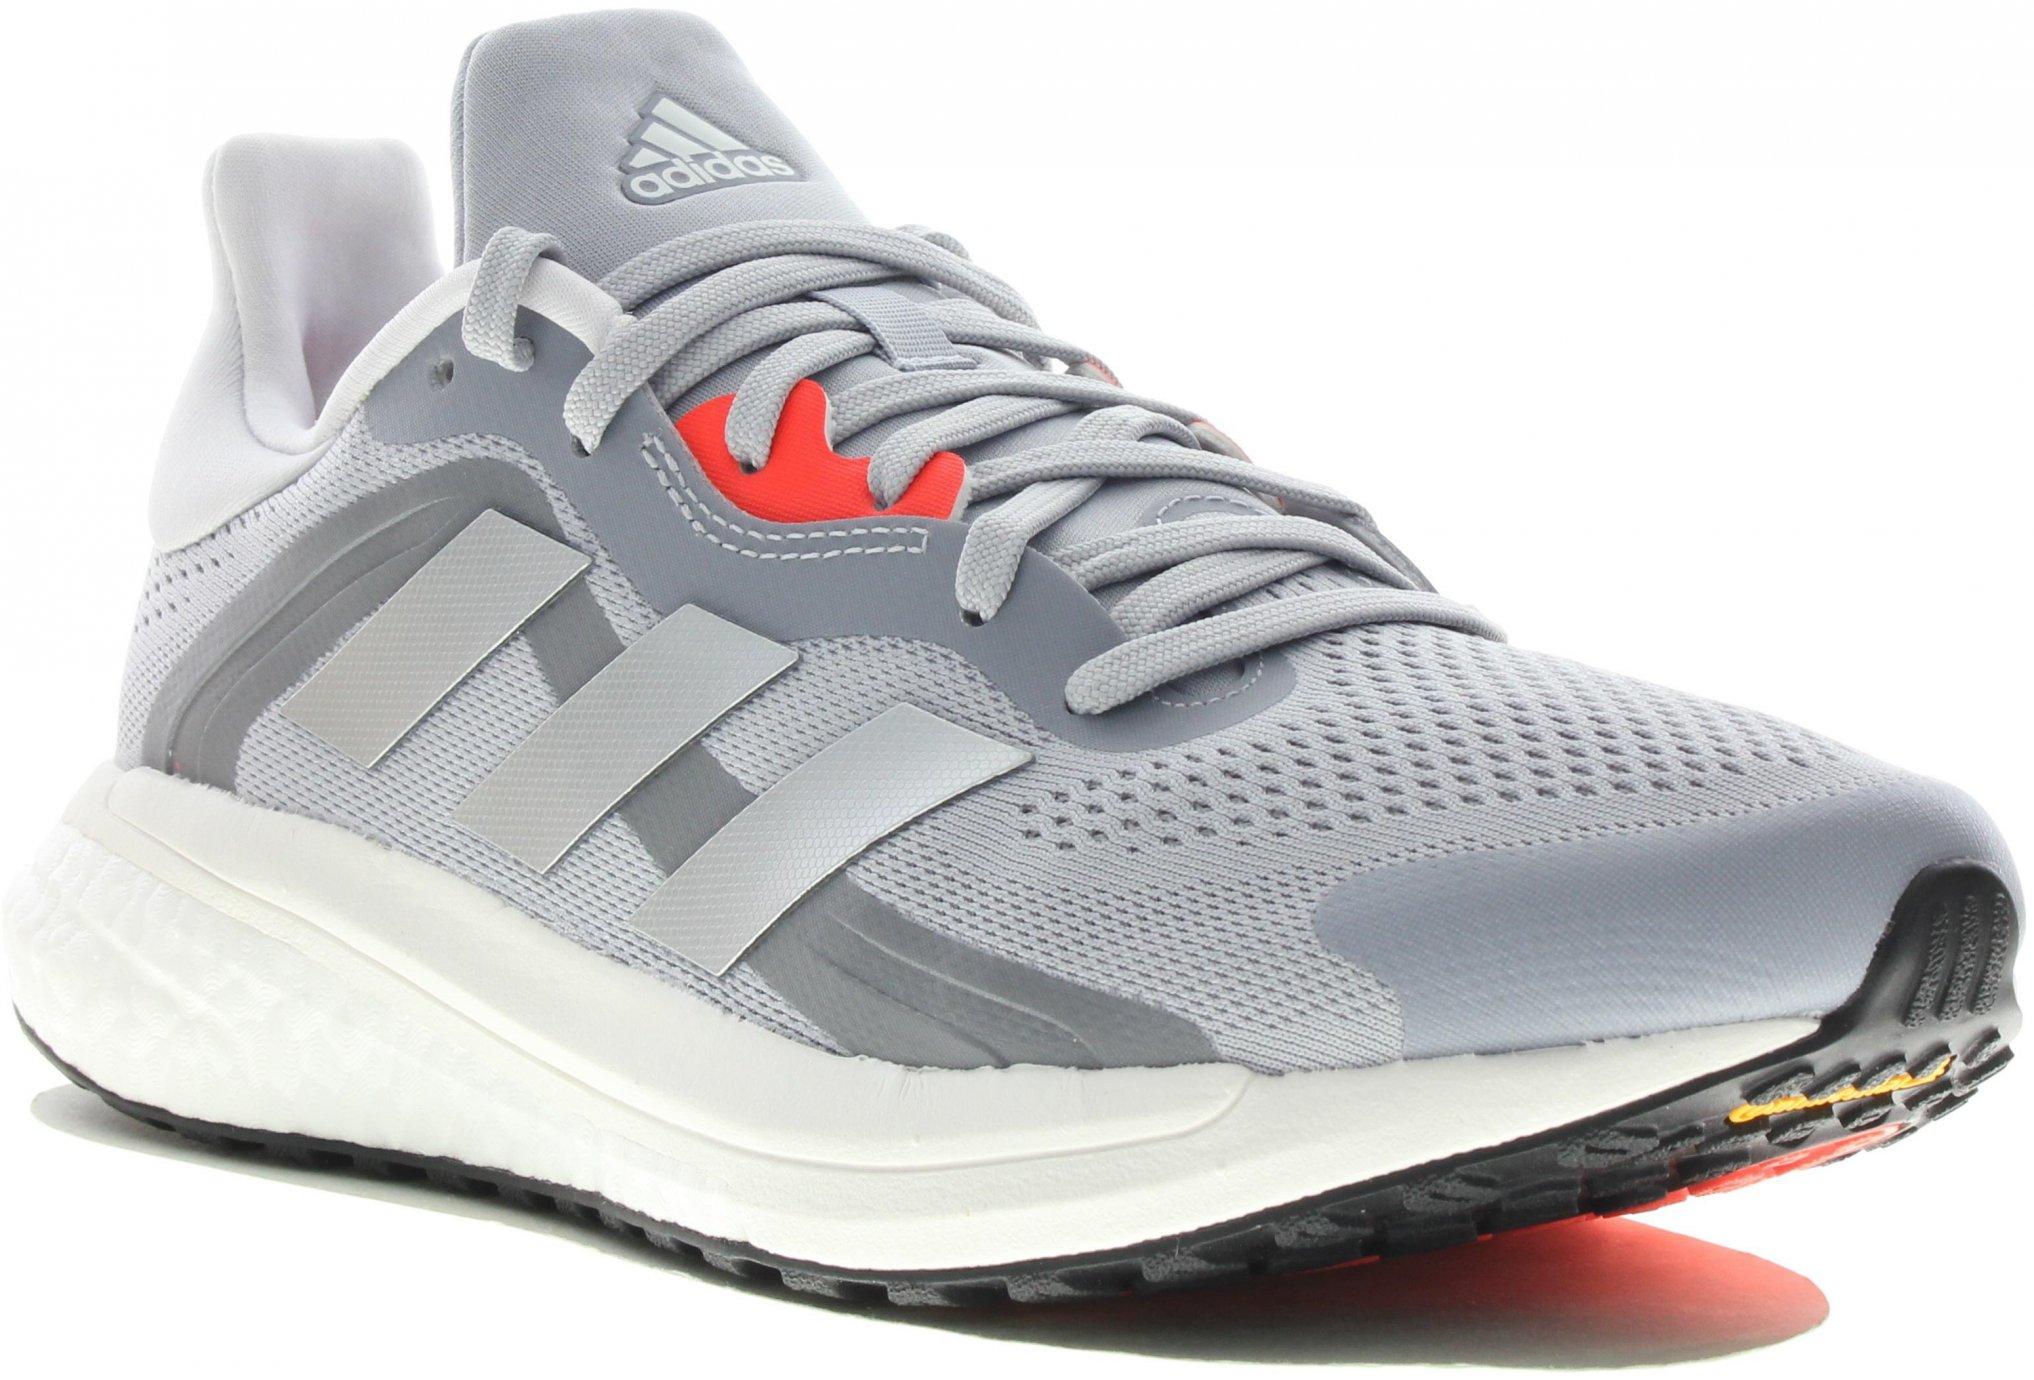 adidas SolarGlide ST 4 Primegreen W Chaussures running femme